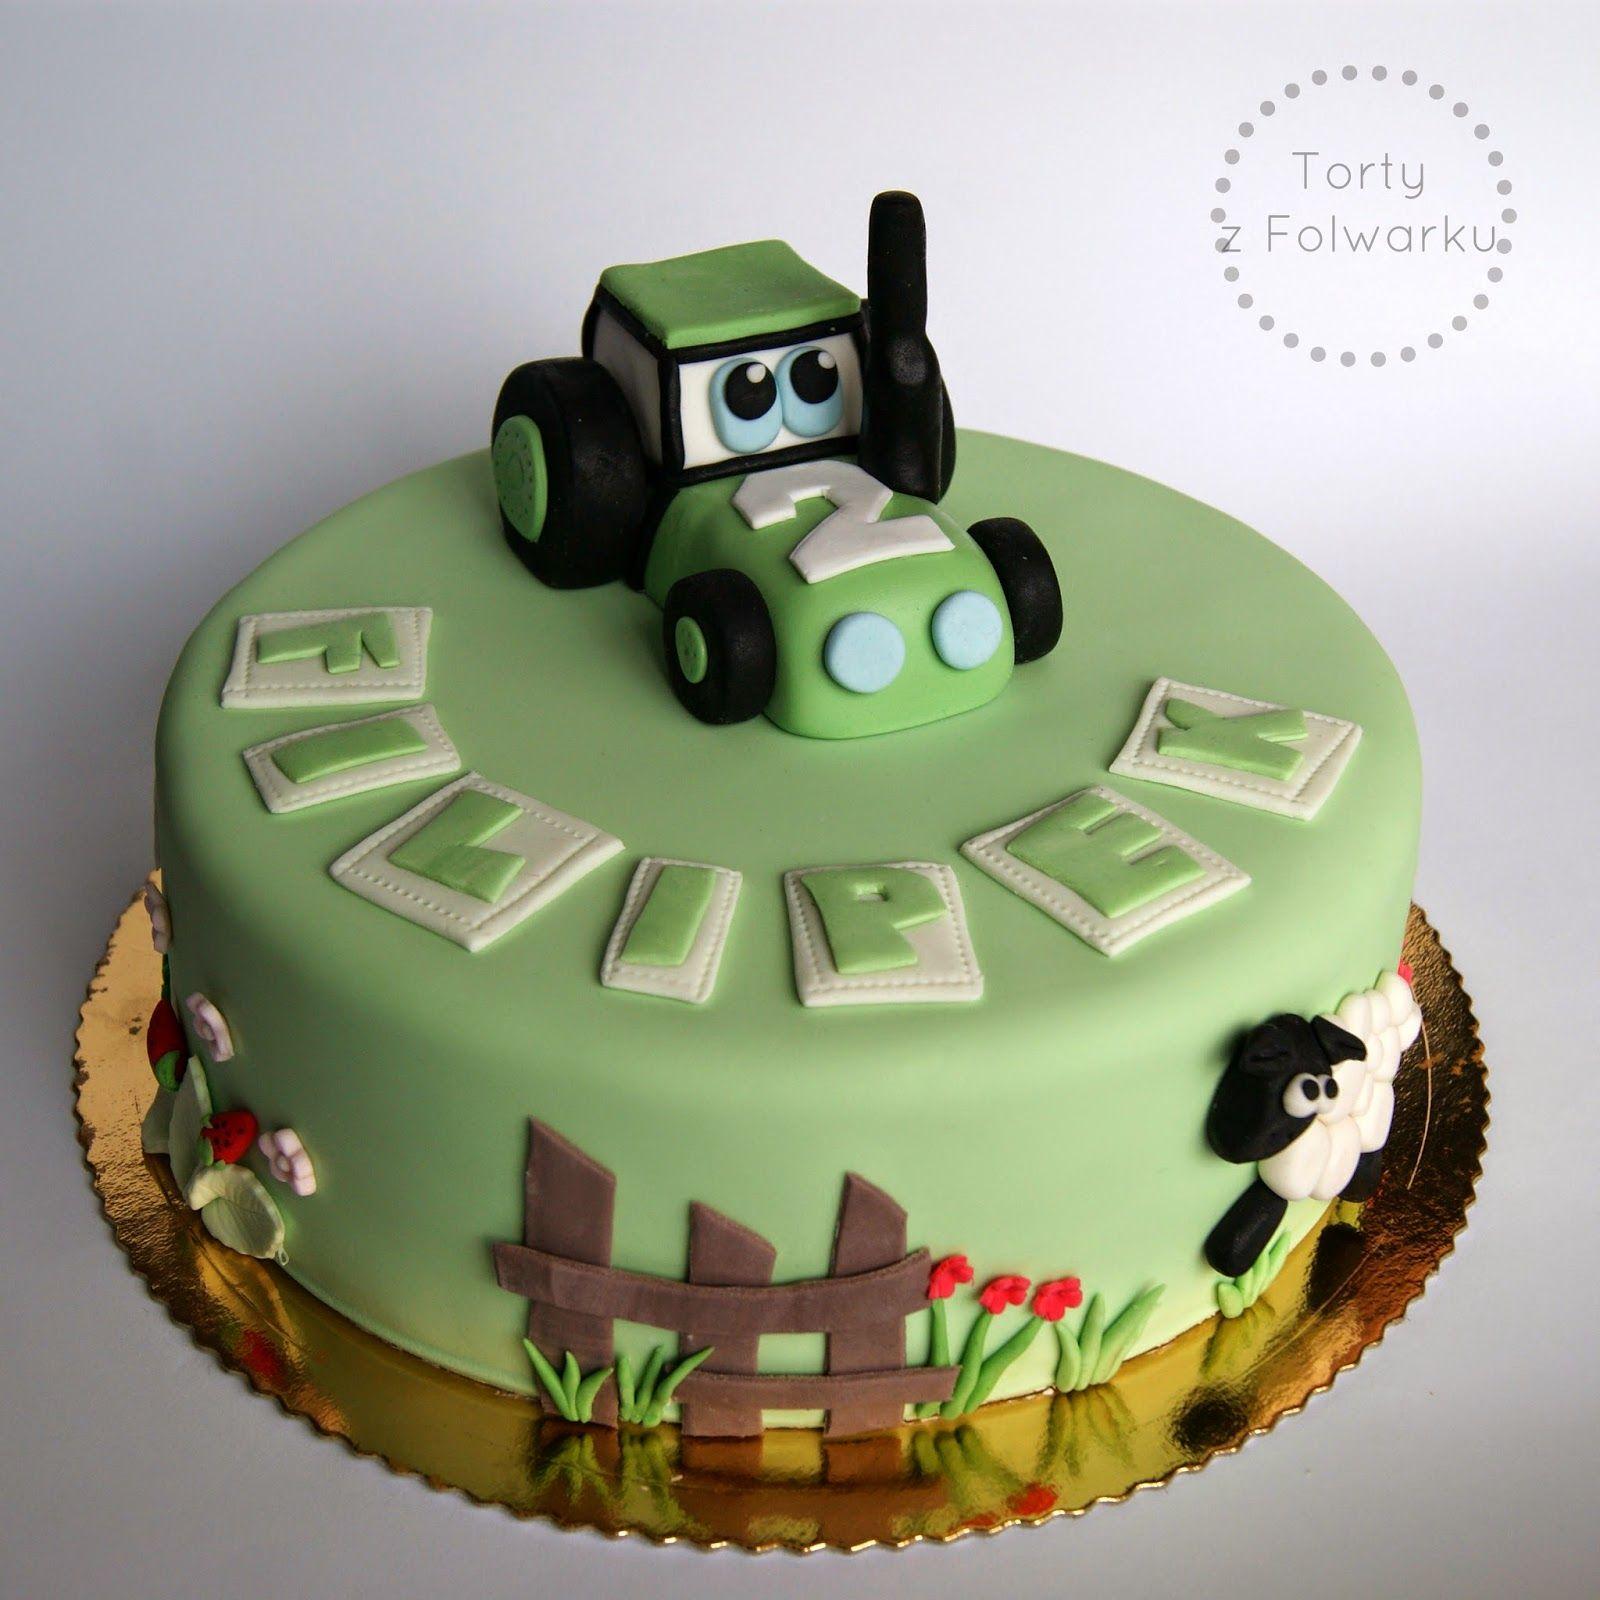 Tort Traktor Jpg 1 600 1 600 Pixelov Kuchen Kindergeburtstag Traktor Geburtstag Torte Junge Torte Kindergeburtstag